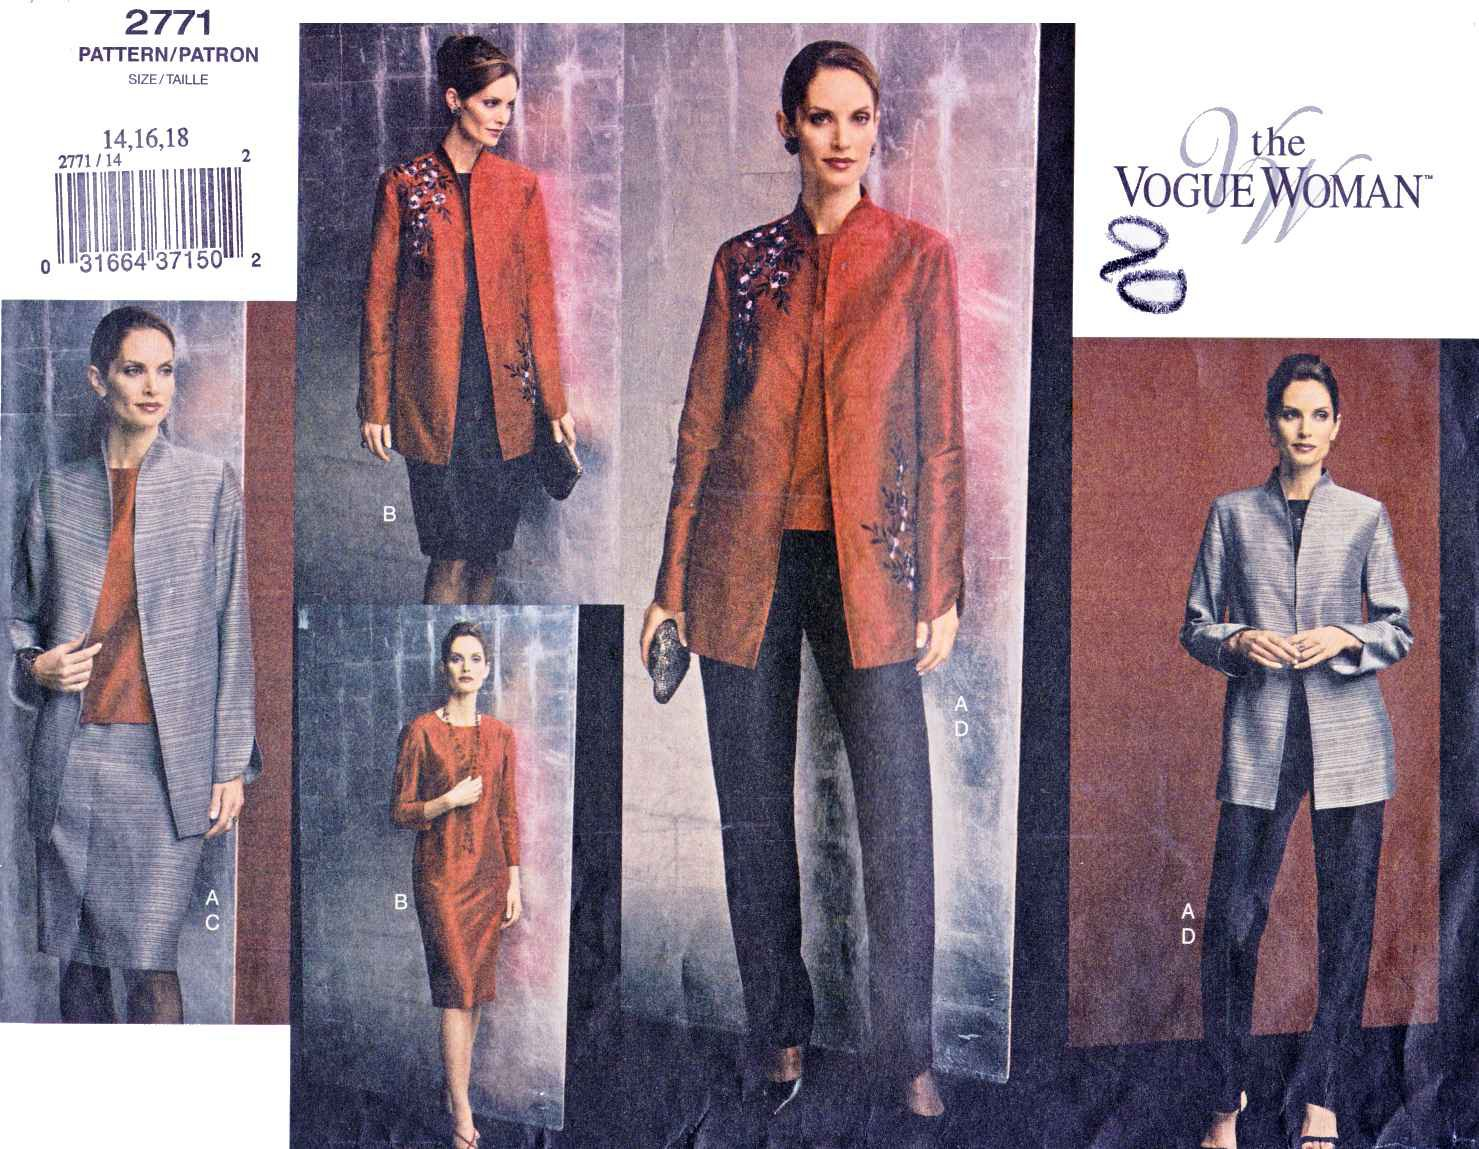 Vogue Sewing Pattern 2771 Misses Size 14-18 Easy Wardrobe Jacket Dress Top Skirt Pants